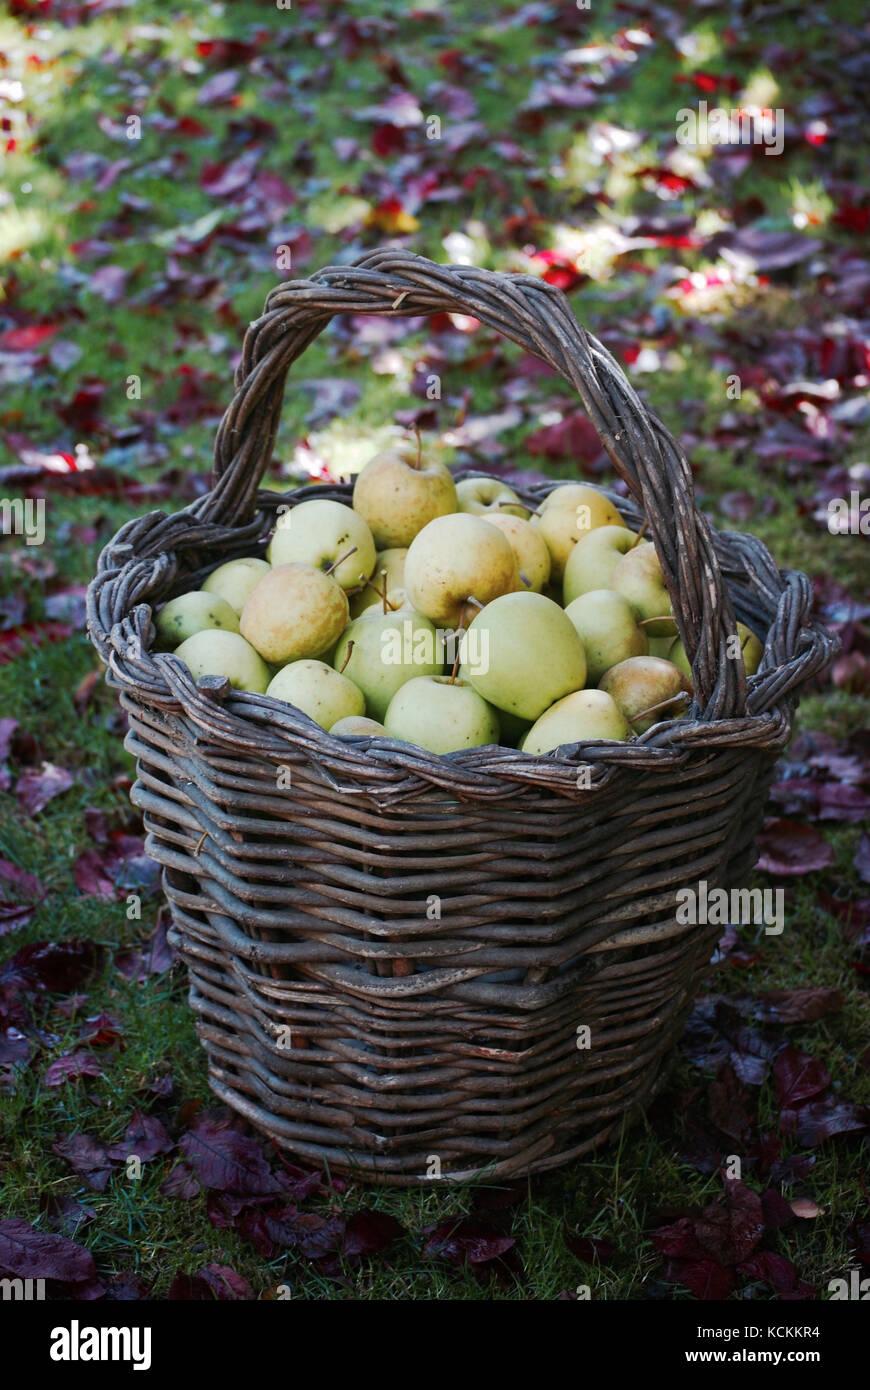 Apple Harvest - Stock Image